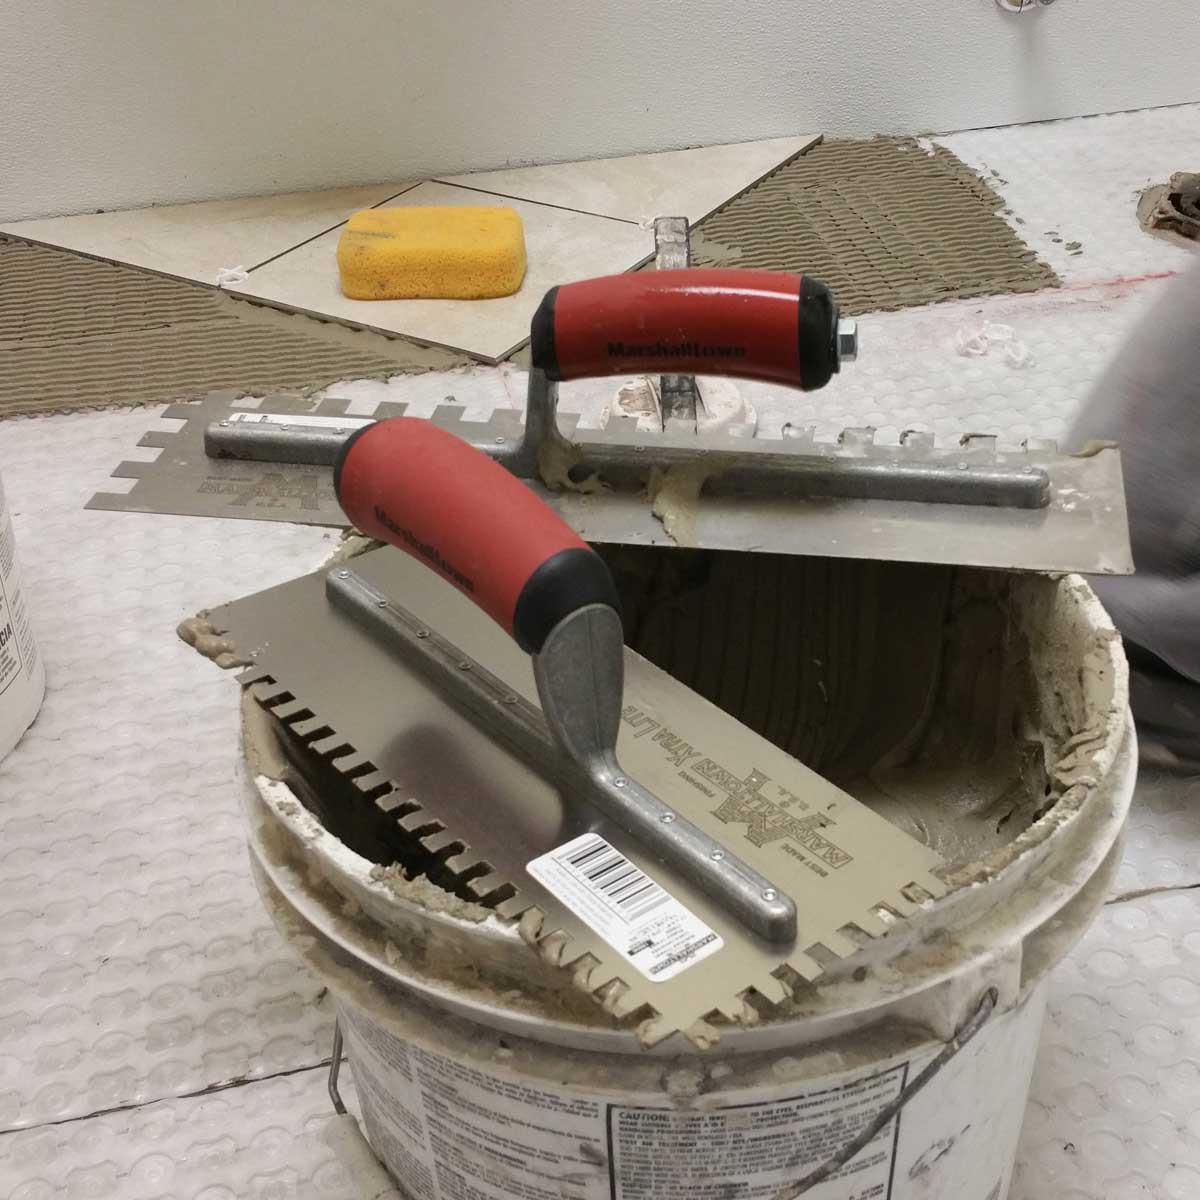 Marshalltown Durasoft Handle Trowels for Installing Tile